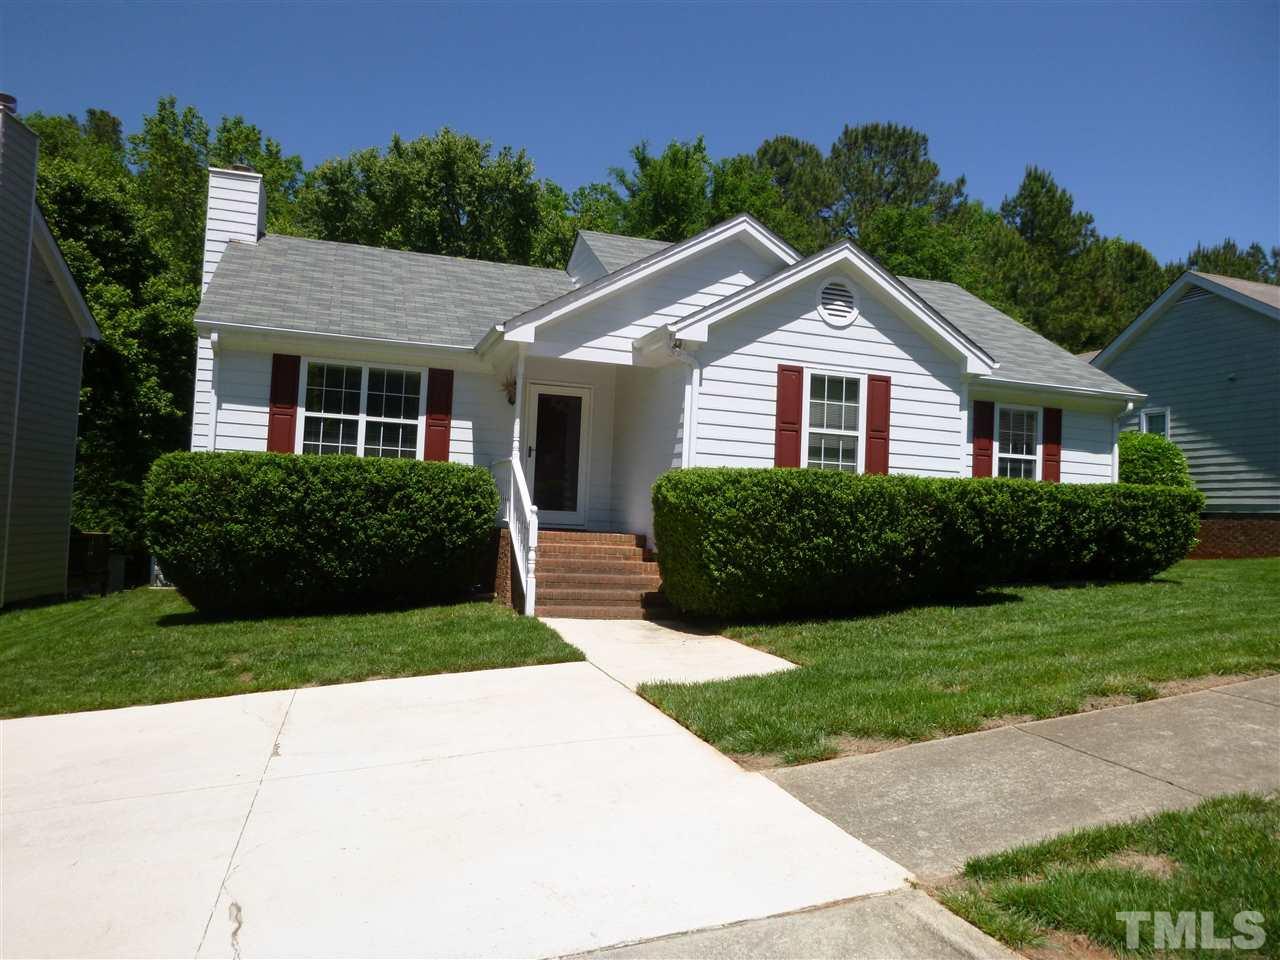 300 W Wyatts Pond Lane, Cary, NC 27513